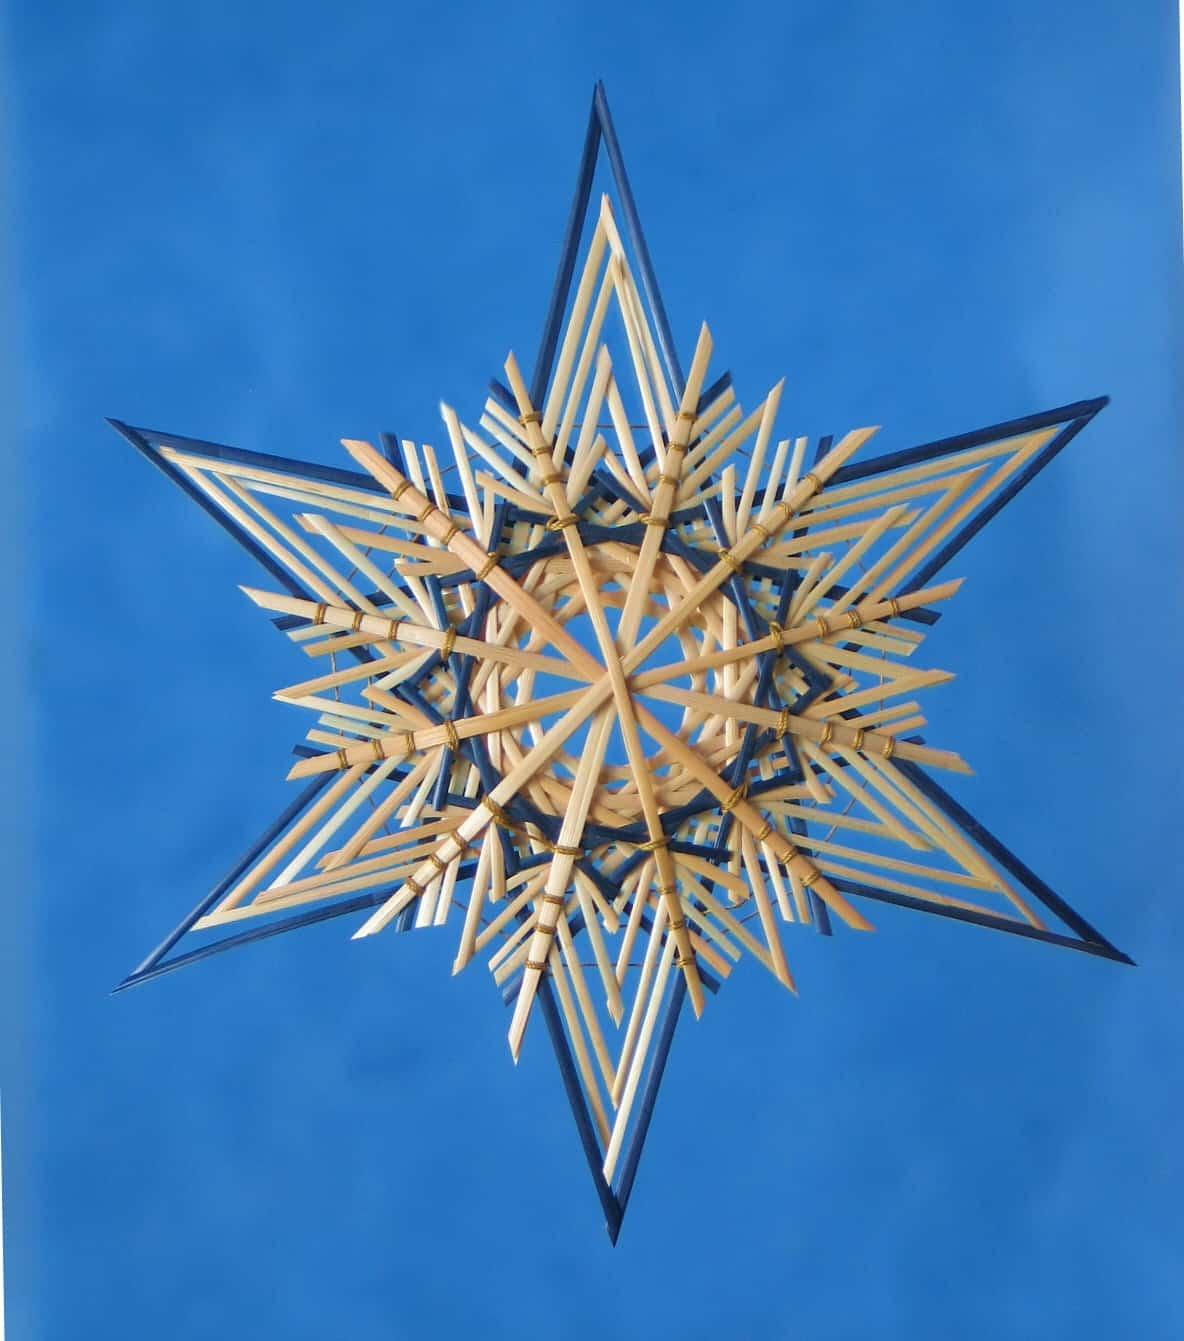 christmas star, star supplies, wheat stalks,